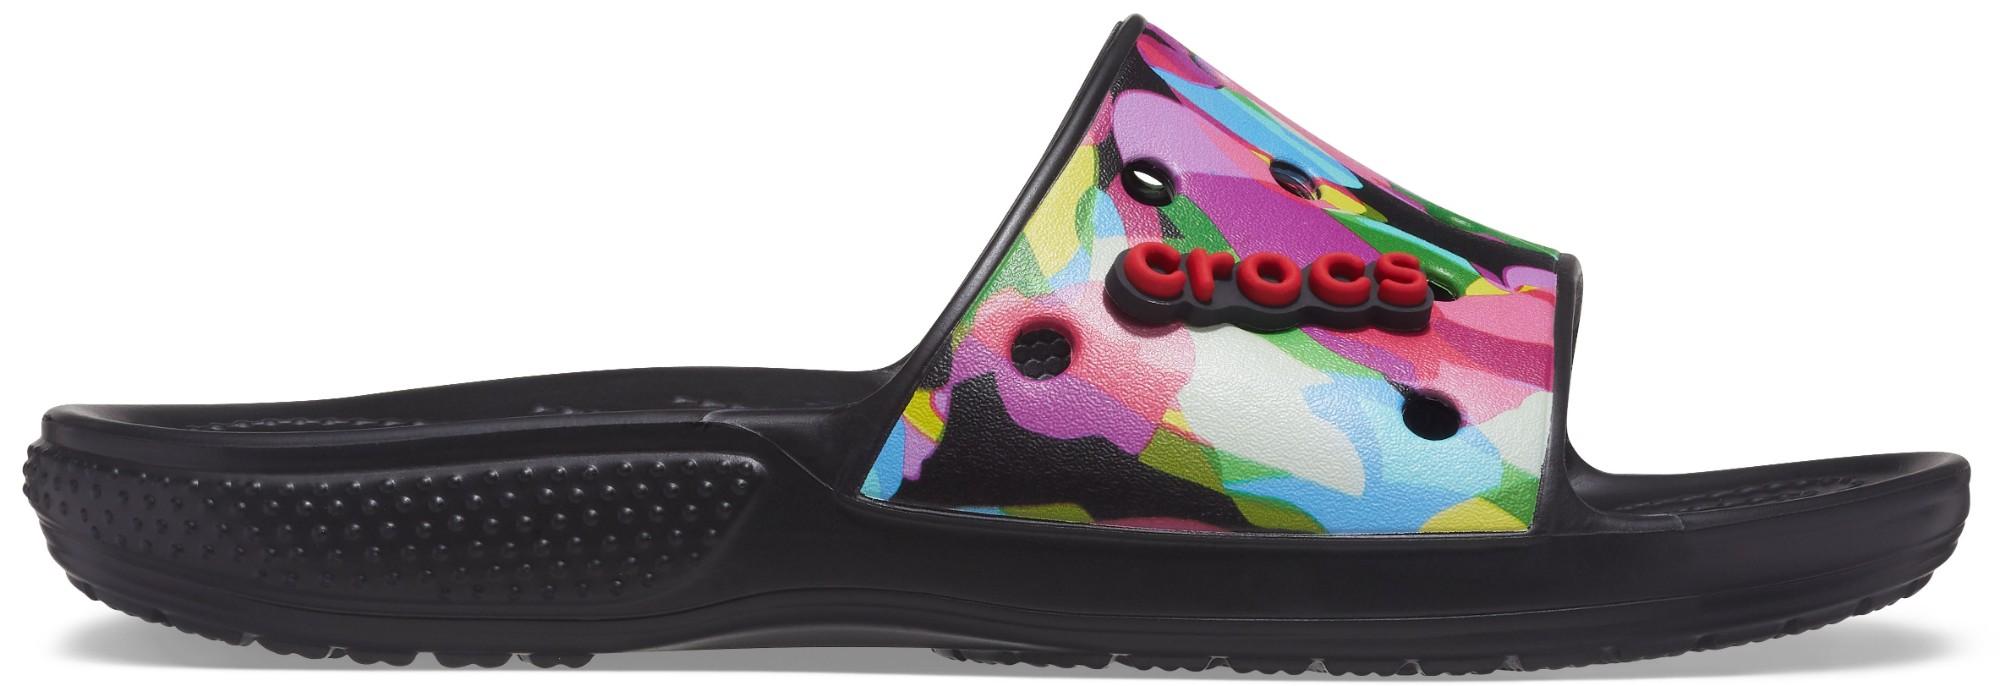 Crocs™ Classic Bubble Block Slide Black/Multi 36,5